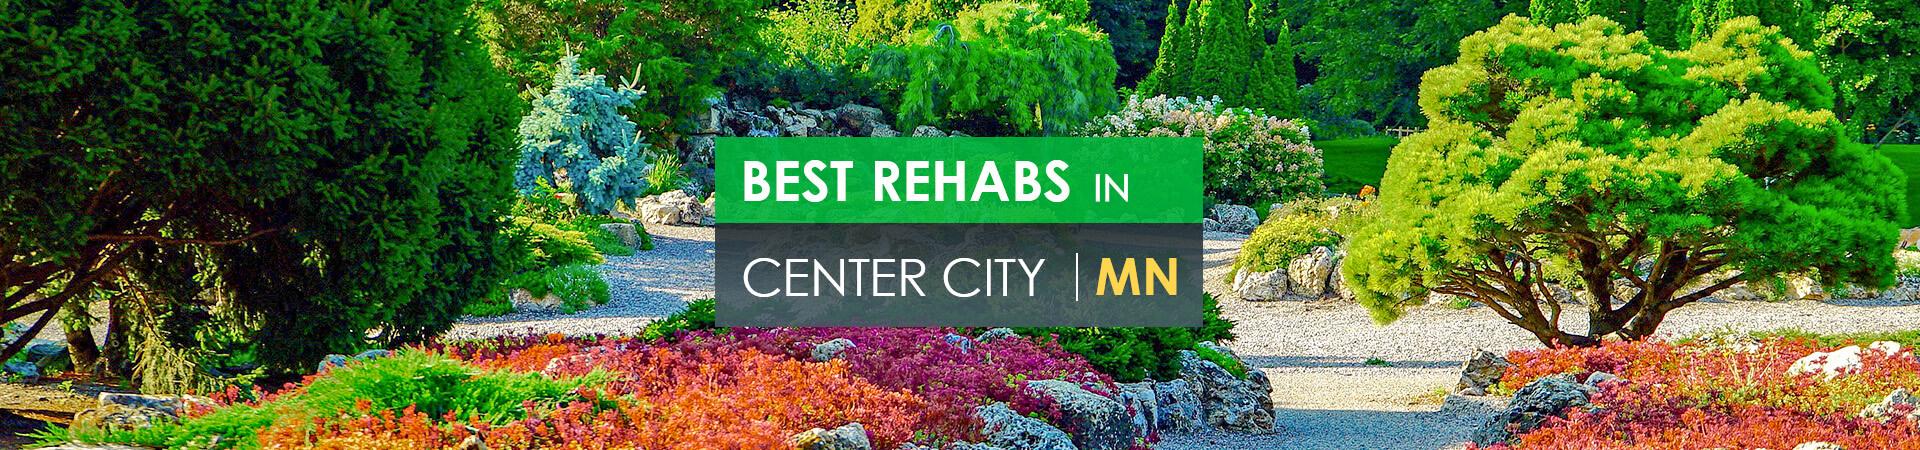 Best rehabs in Center City, MN